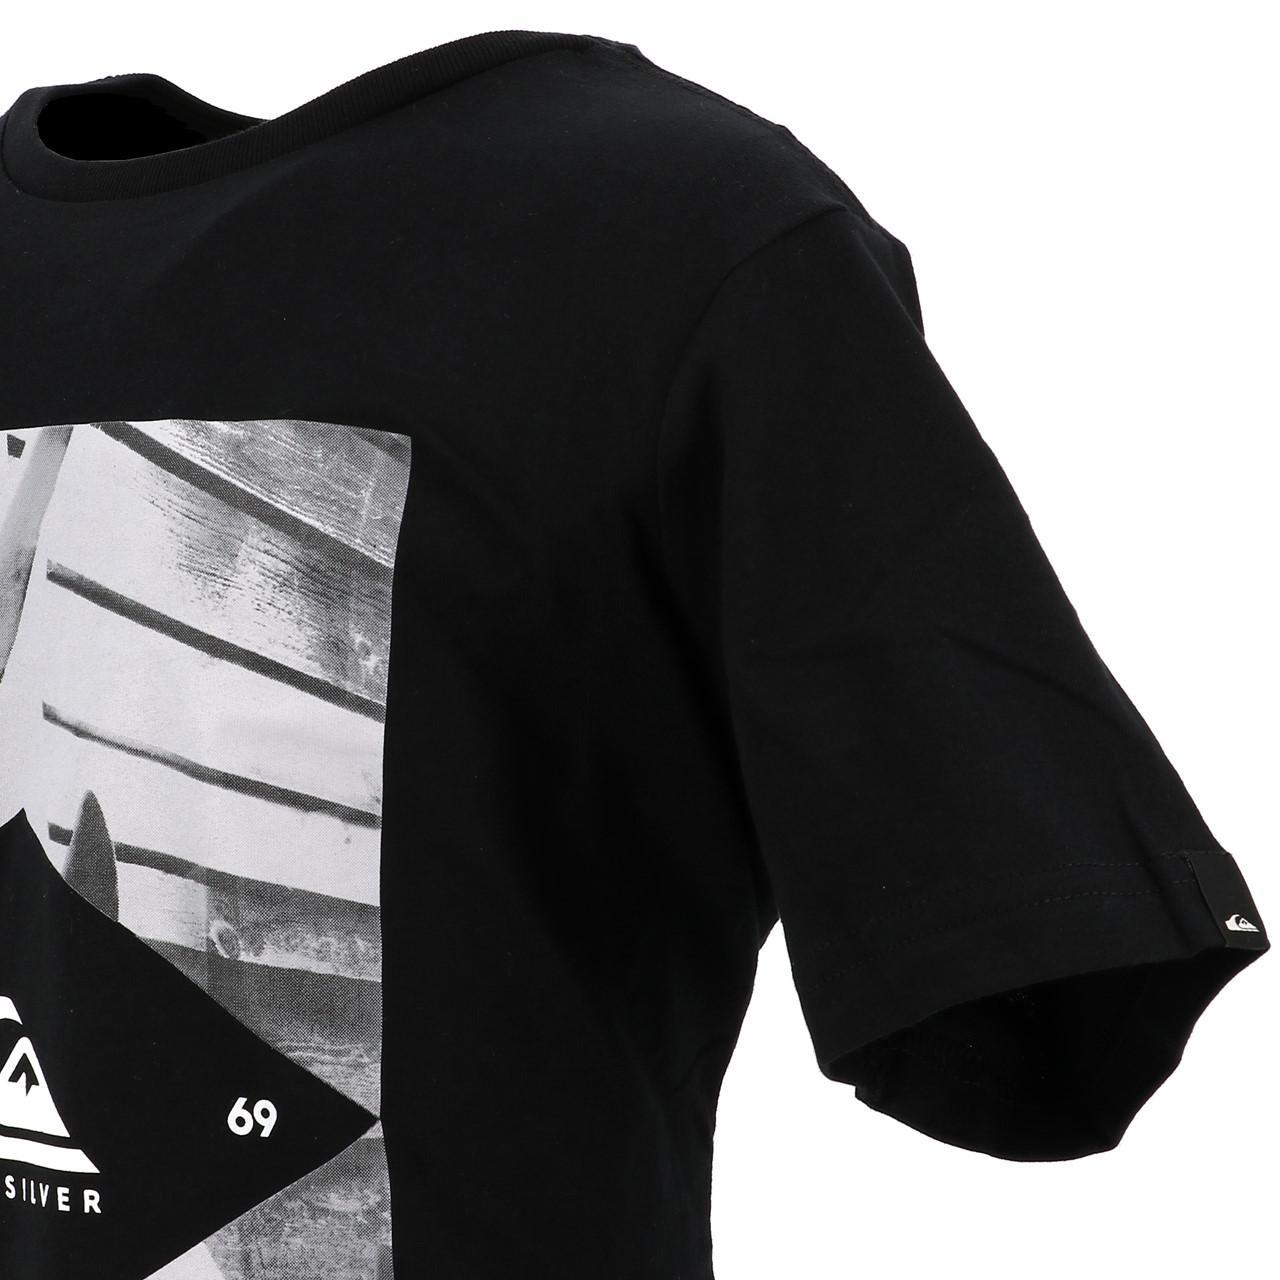 Tee-shirt-manches-courtes-Quiksilver-15341-flaxton-blk-jr-sp2-Noir-17517-Neuf miniature 3